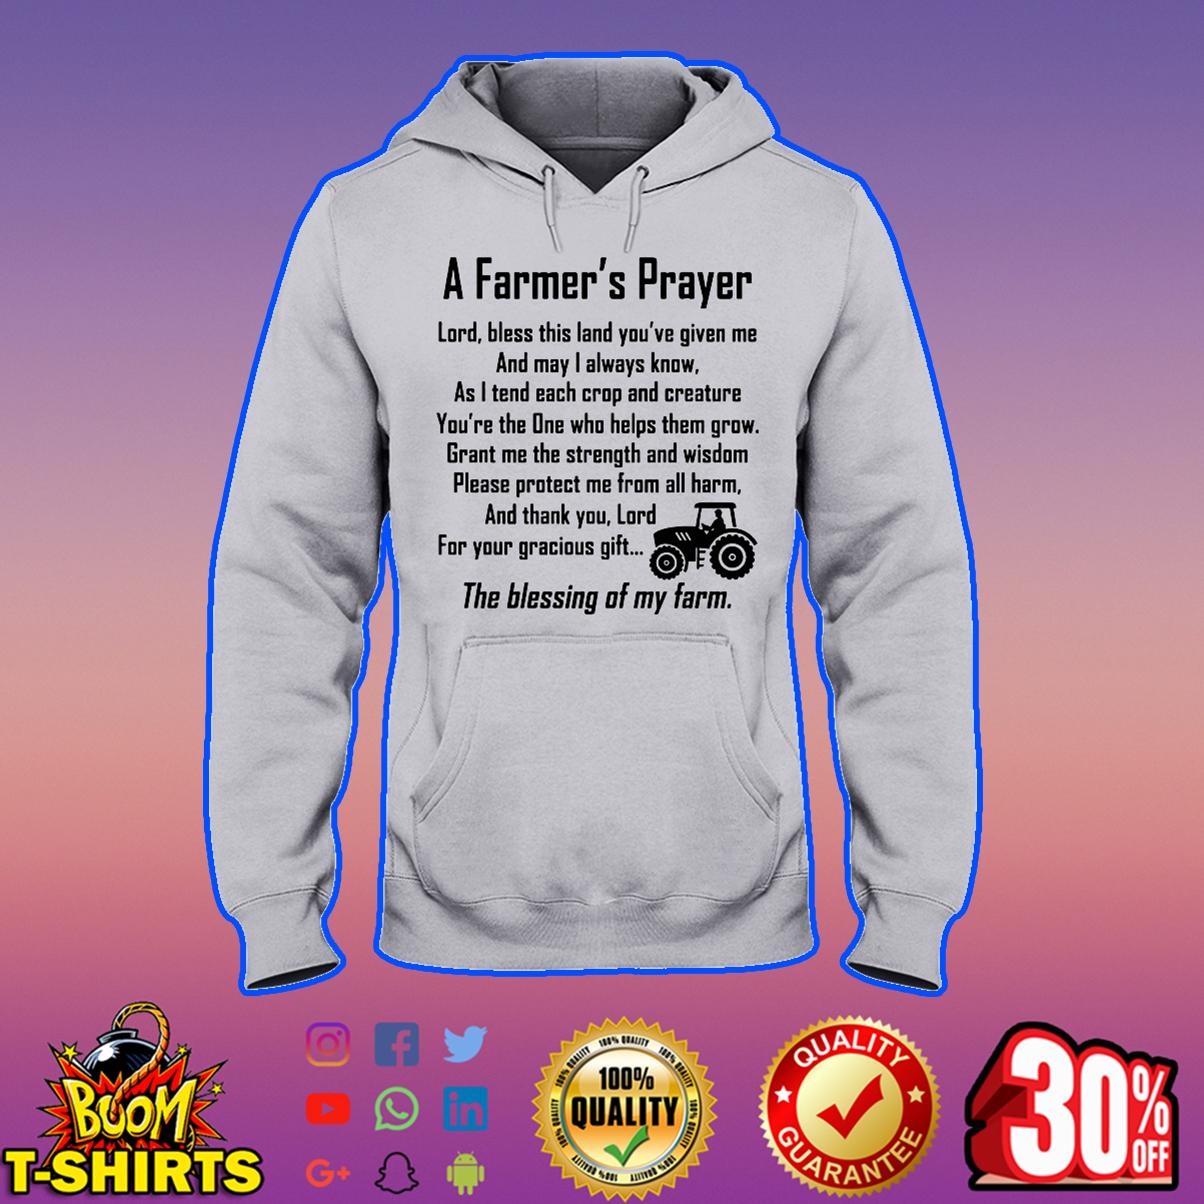 A farmer's prayer hooded sweatshirt